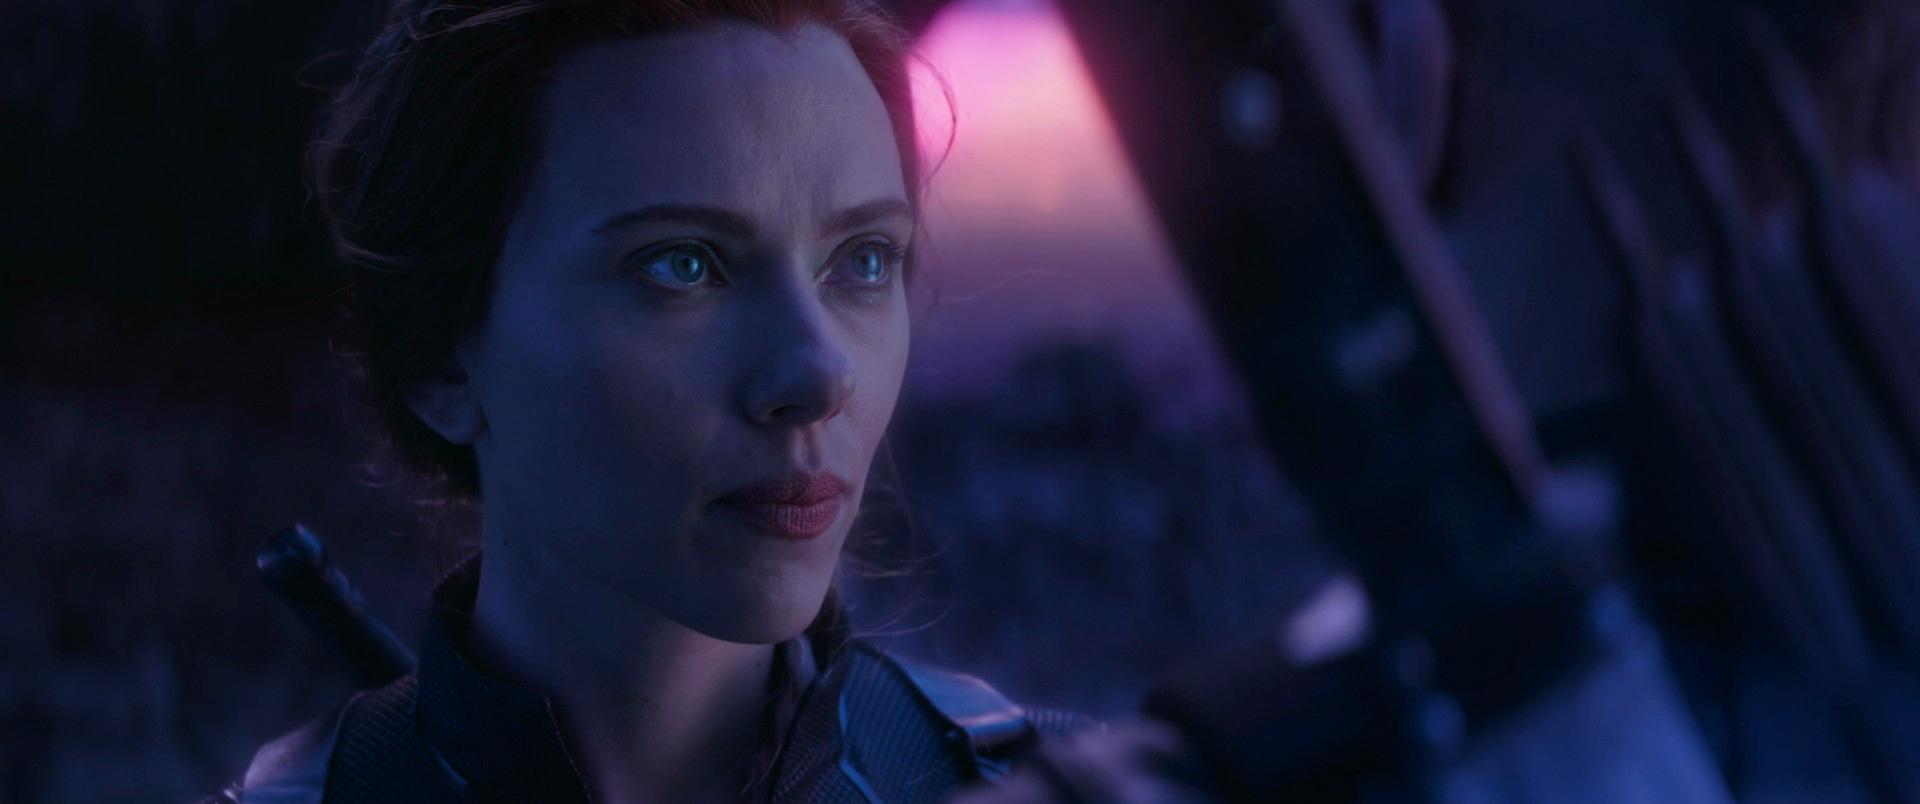 Wallpaper Scarlett Johansson Actress Women Blue Eyes